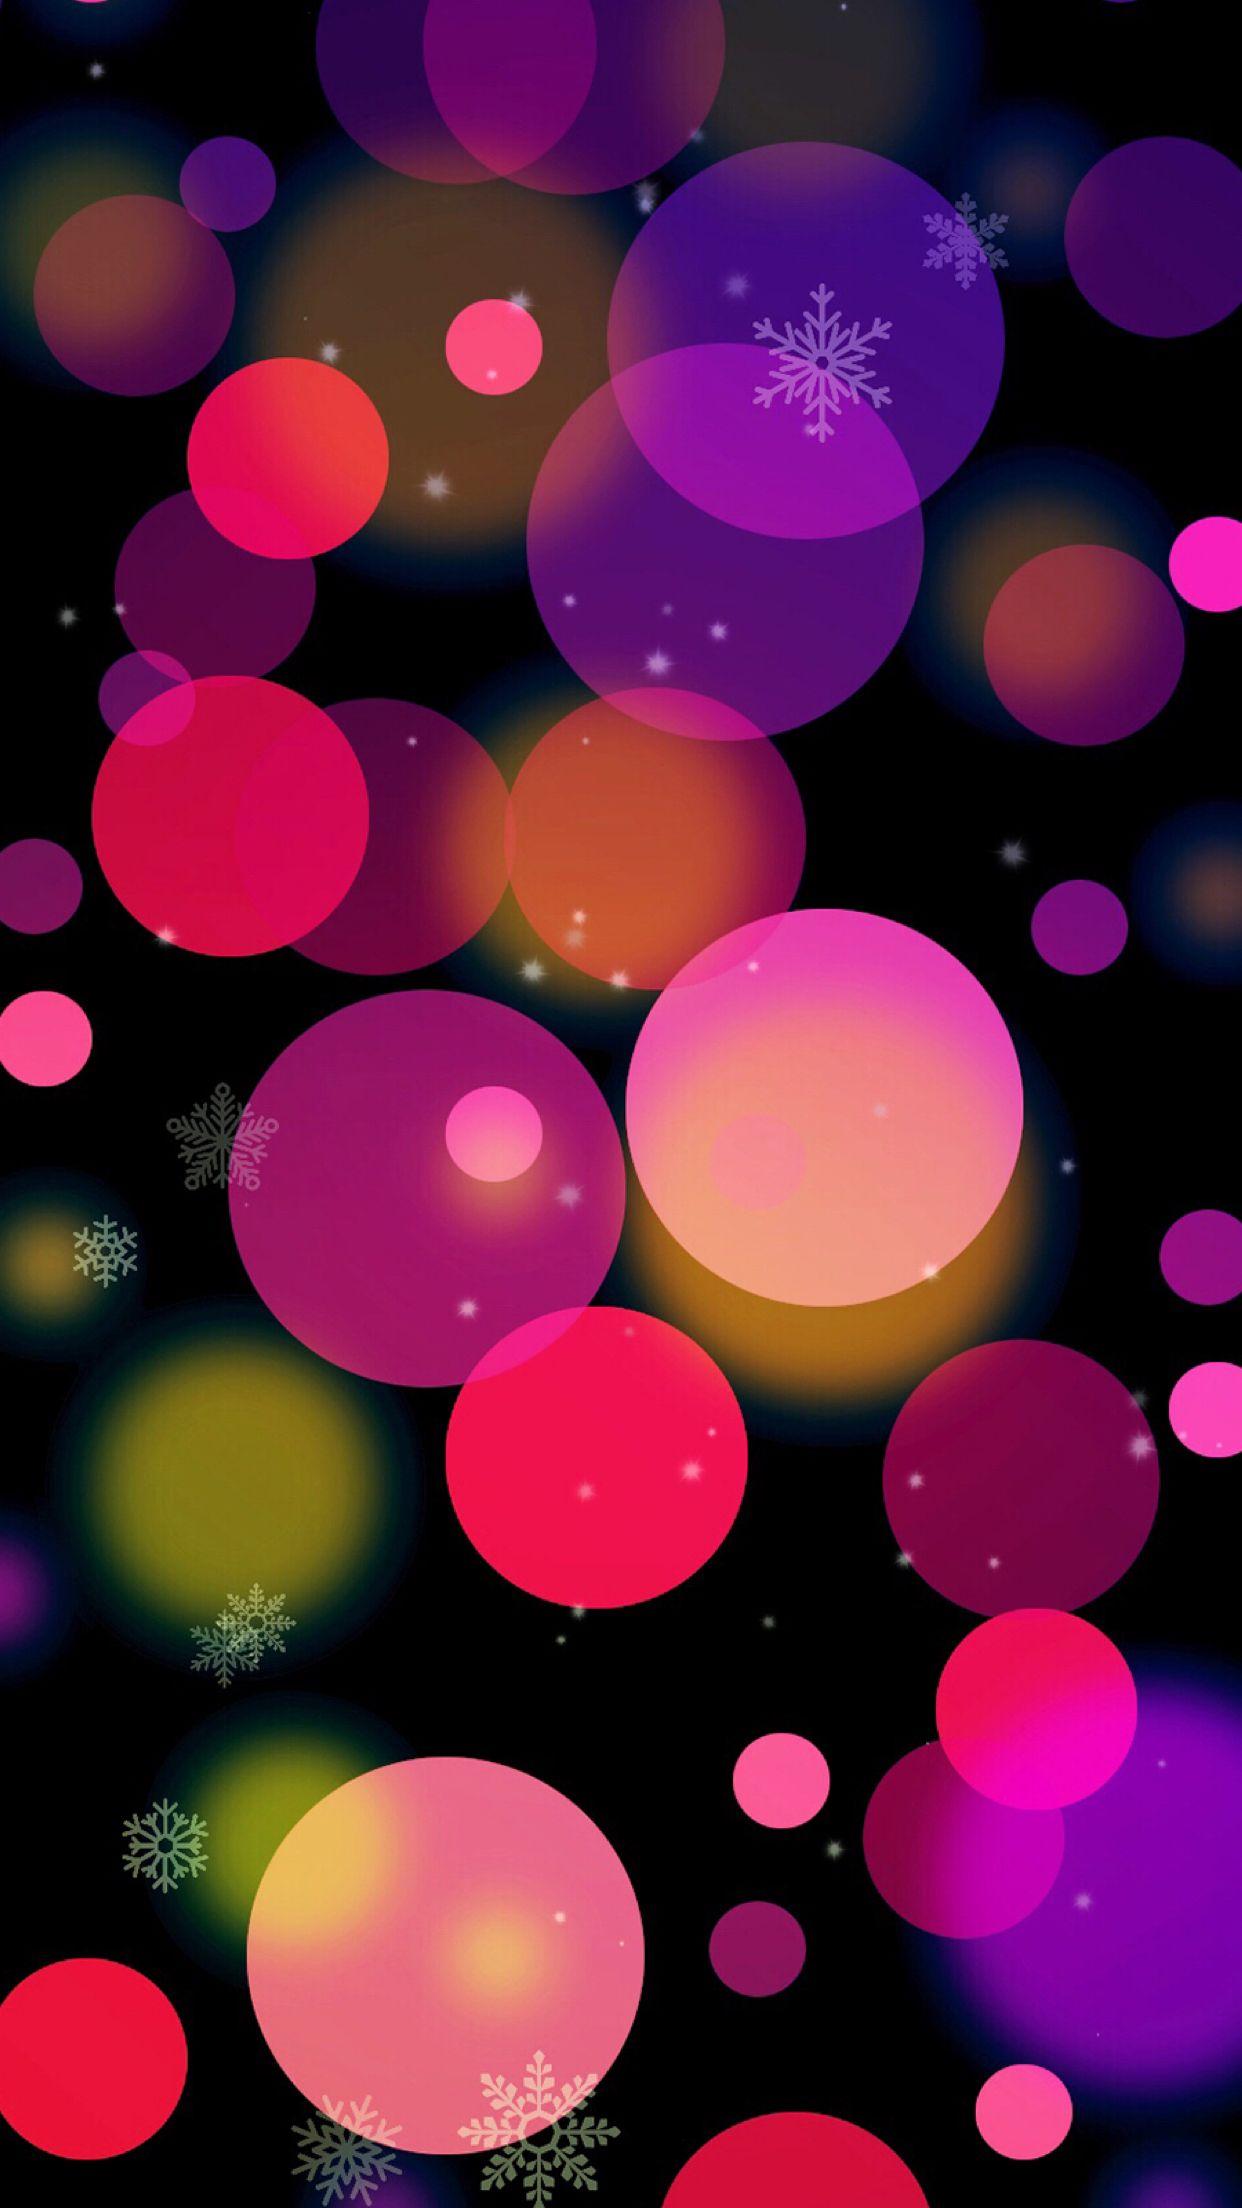 Snow And Bocah Bubbles Wallpaper Flower Iphone Wallpaper Hello Wallpaper